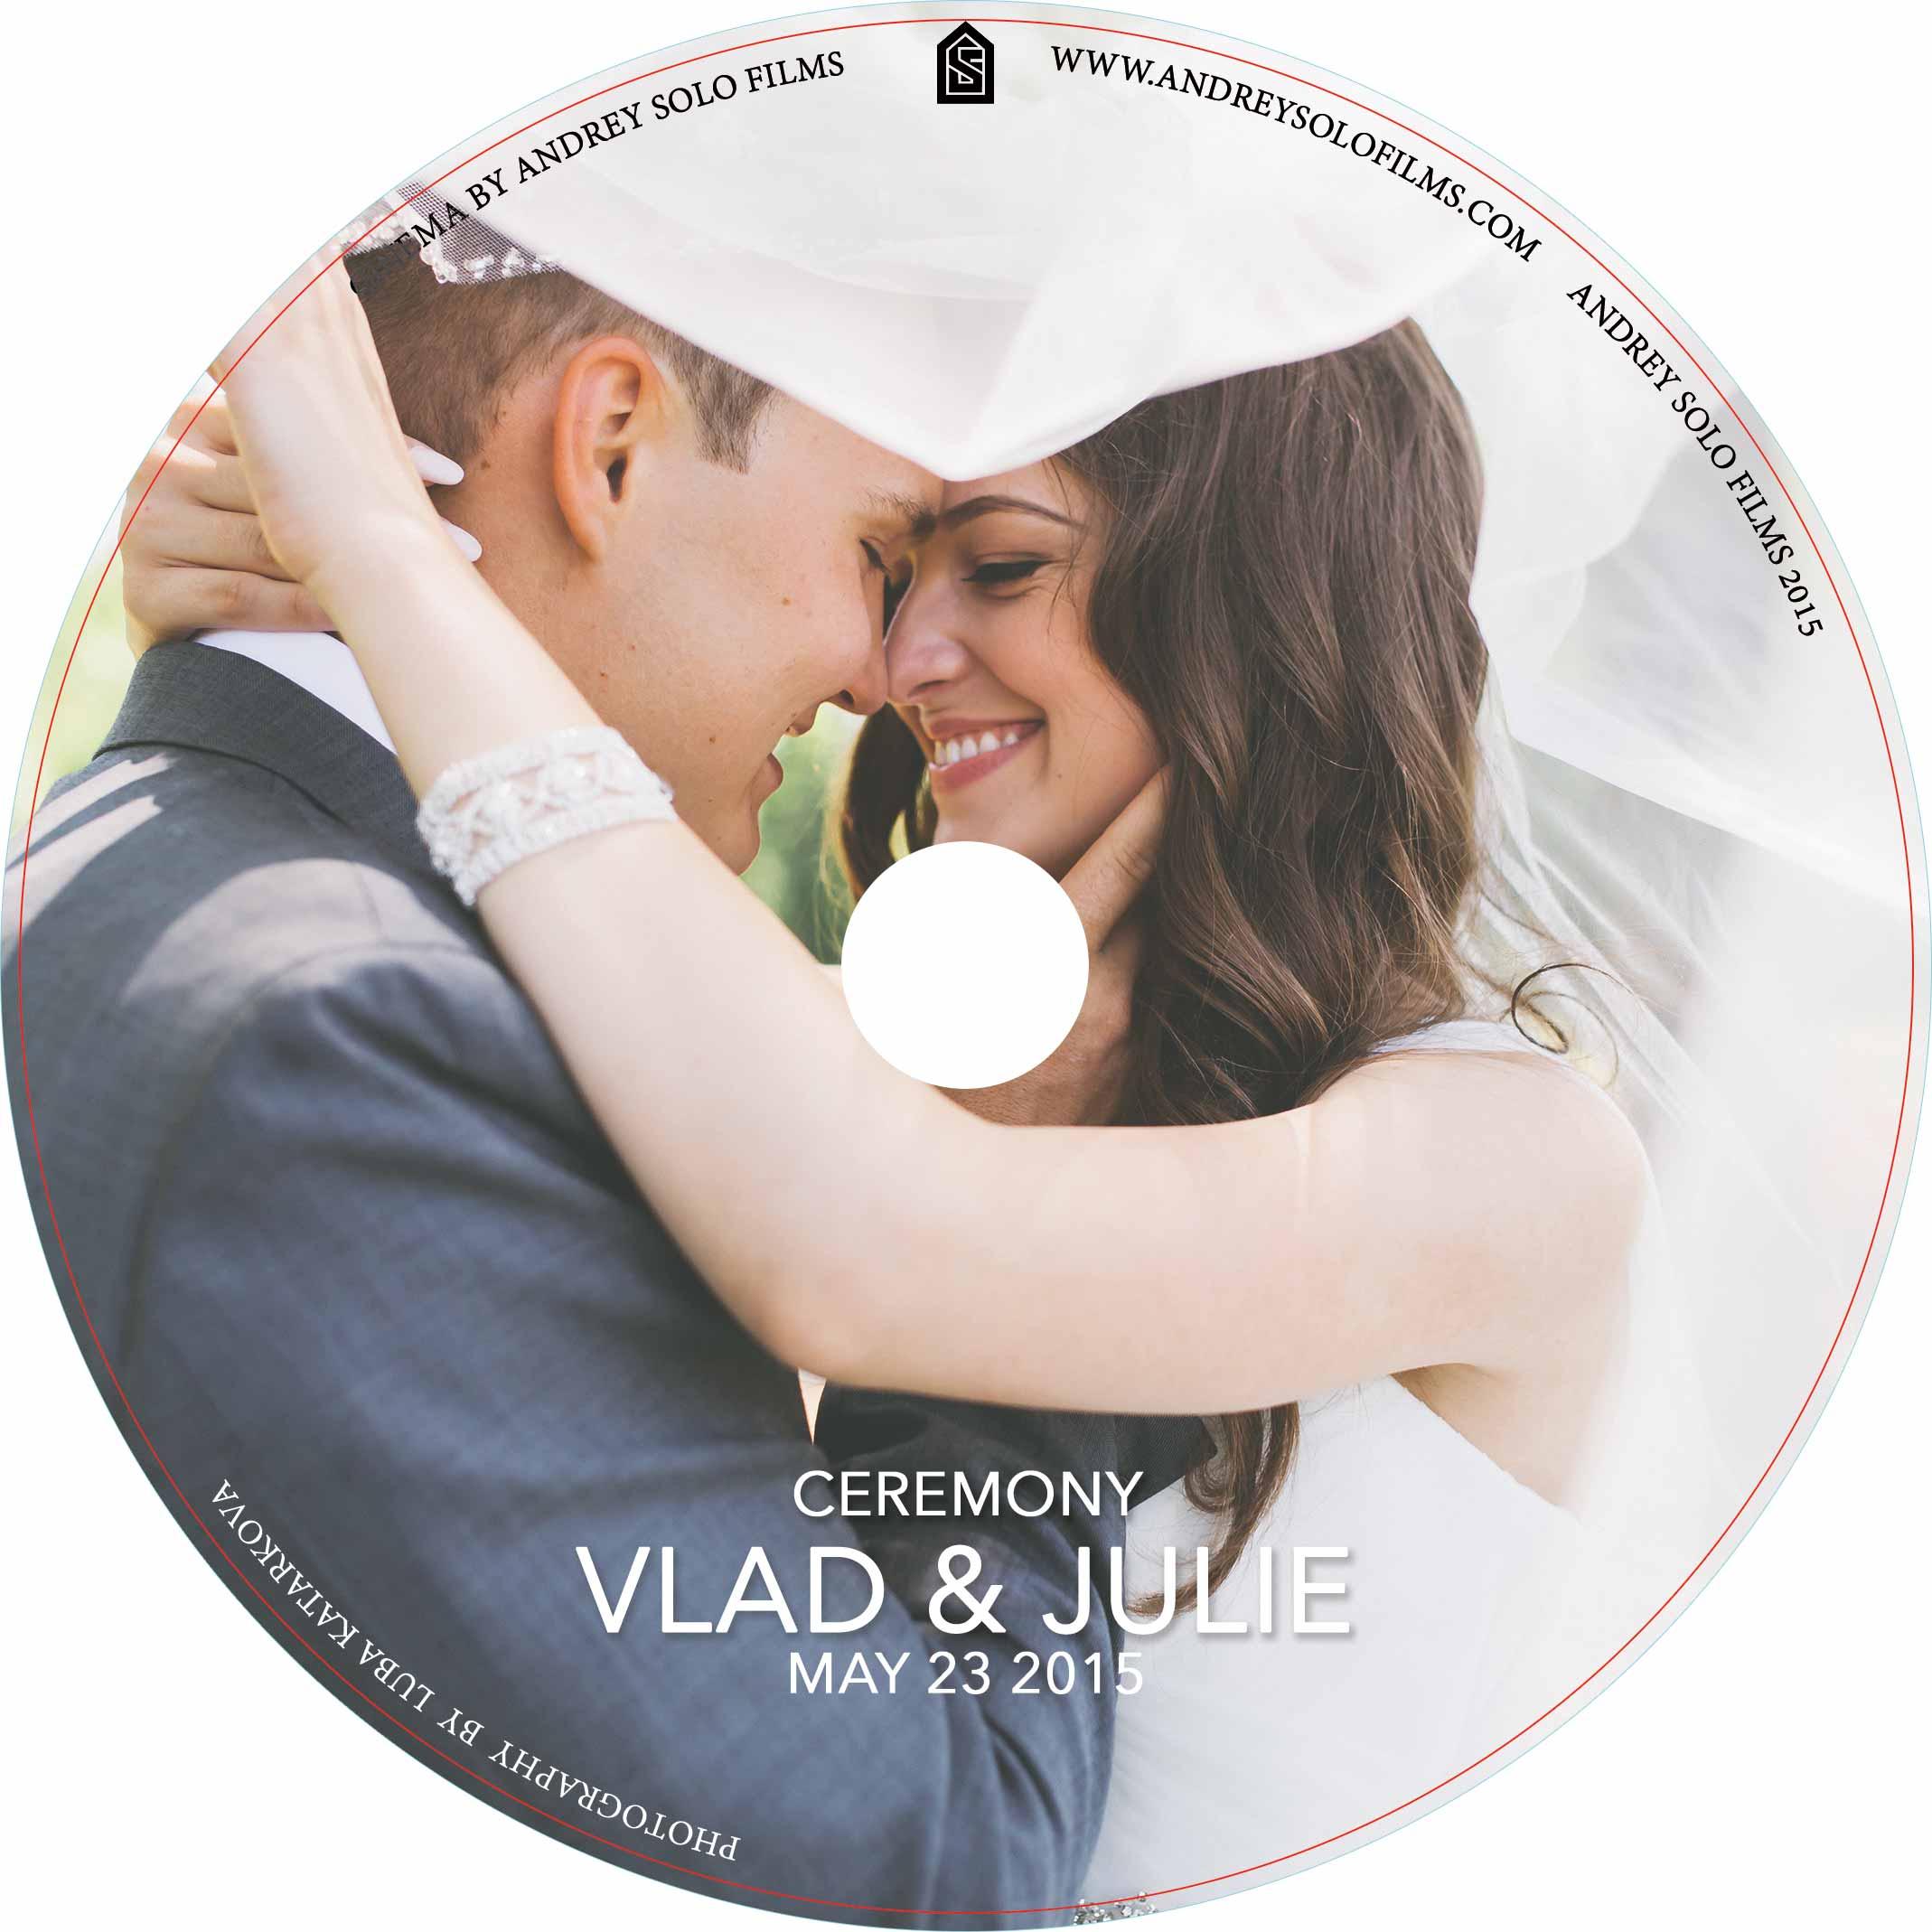 DVD-Disc-Template-2015white.jpg